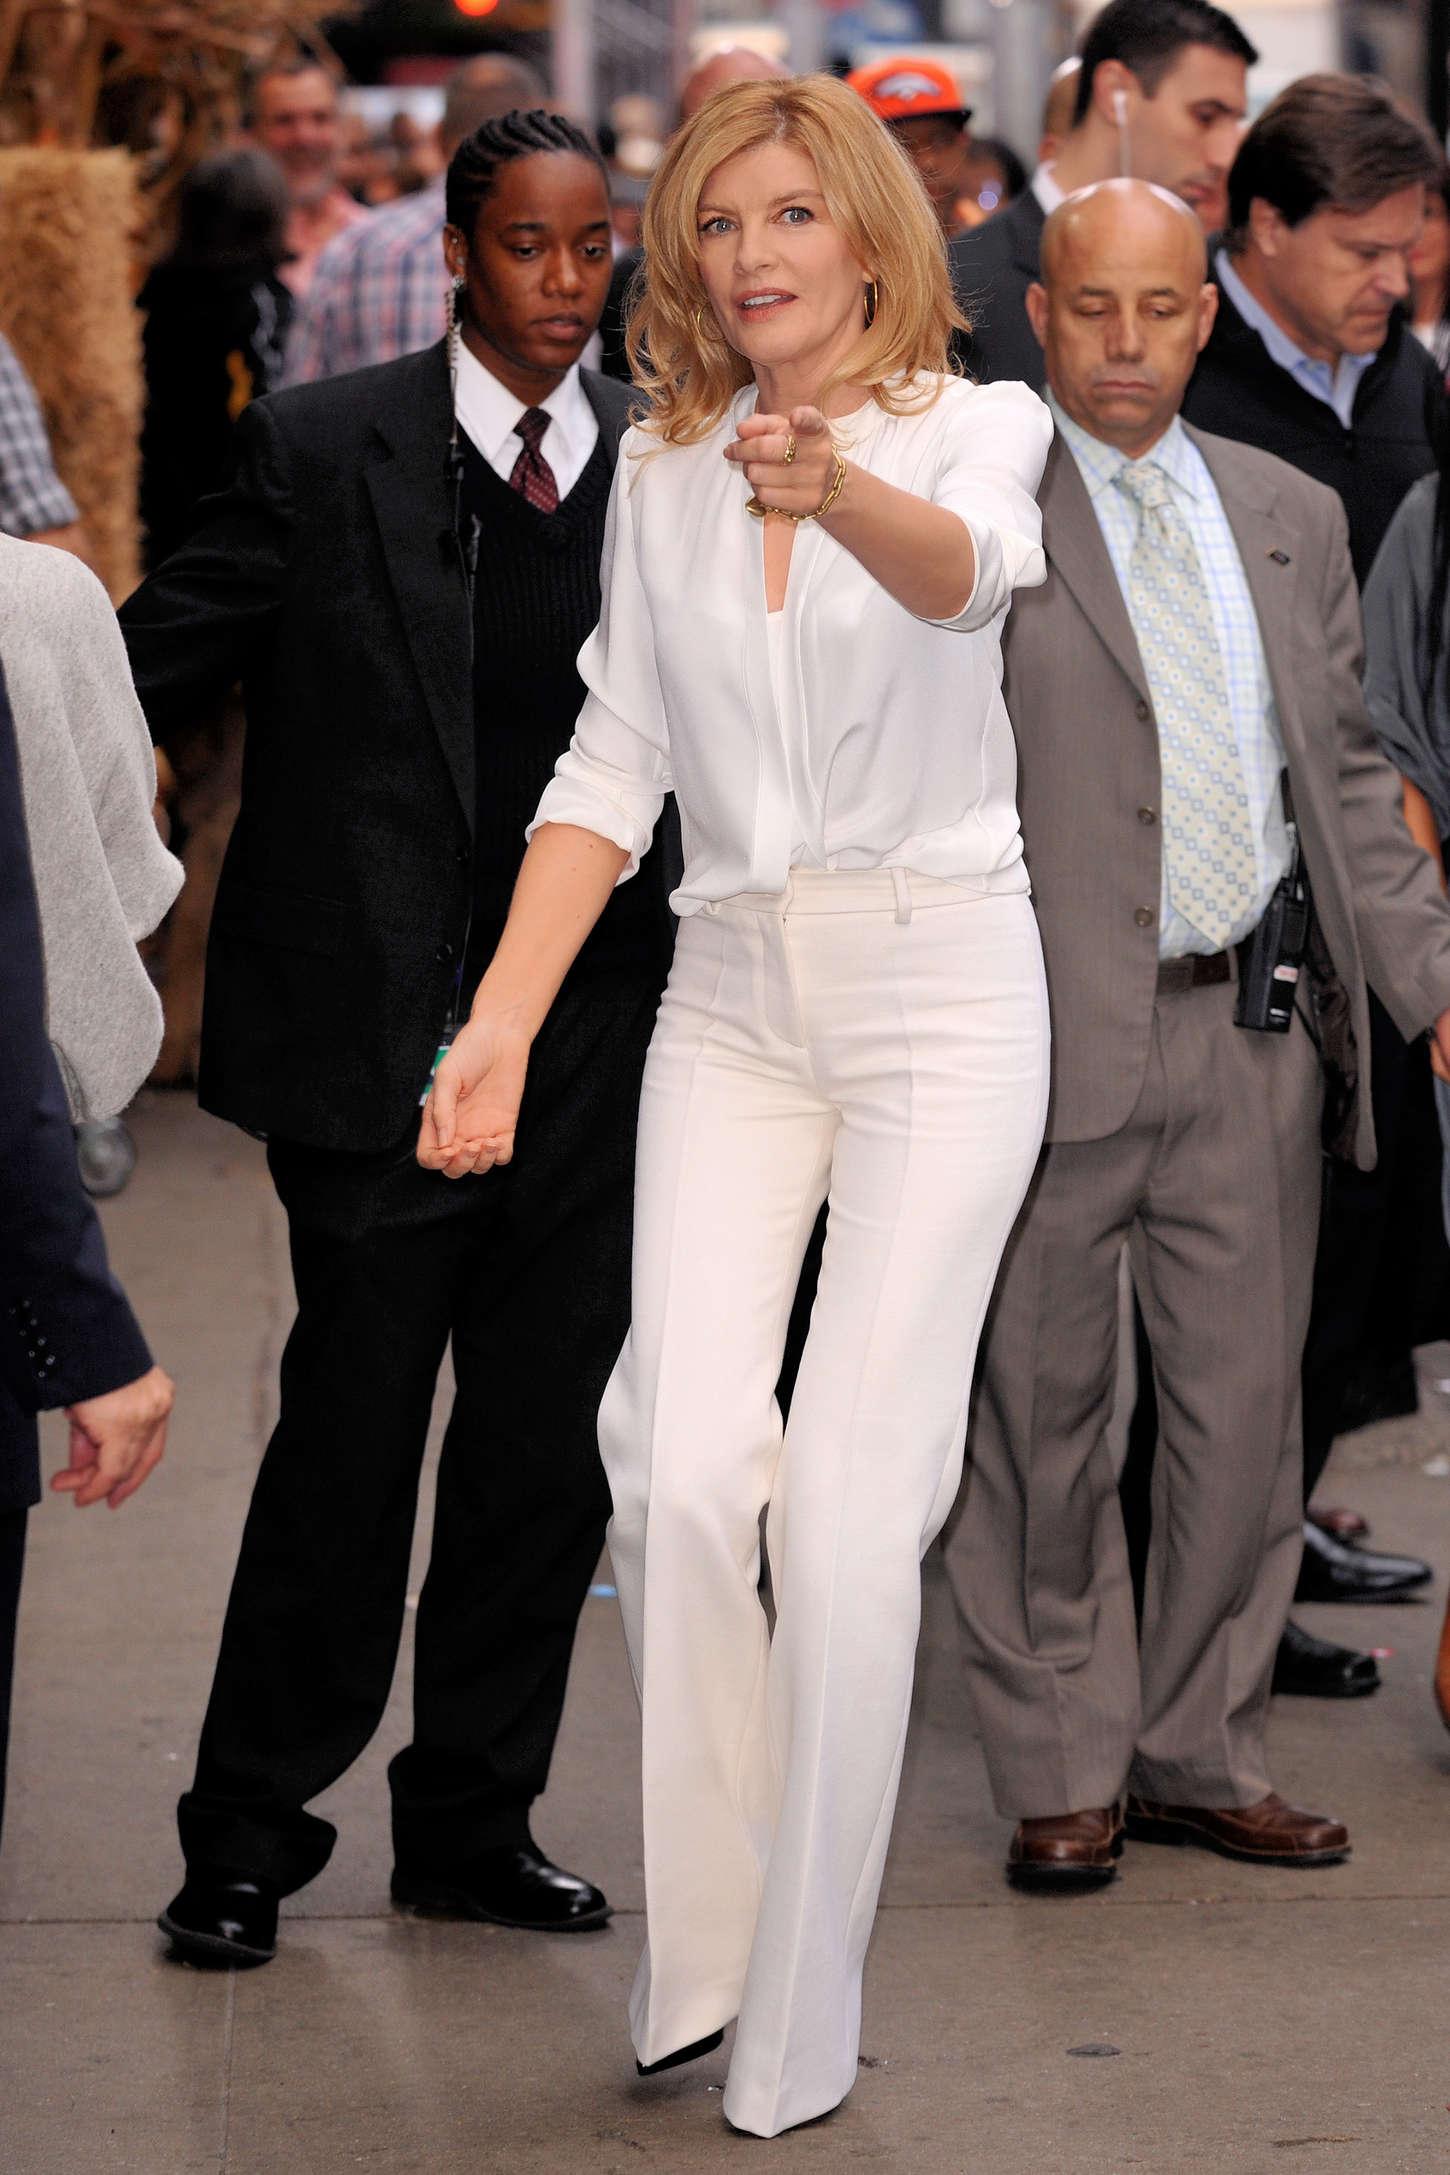 Rene Russo Good Morning America in New York